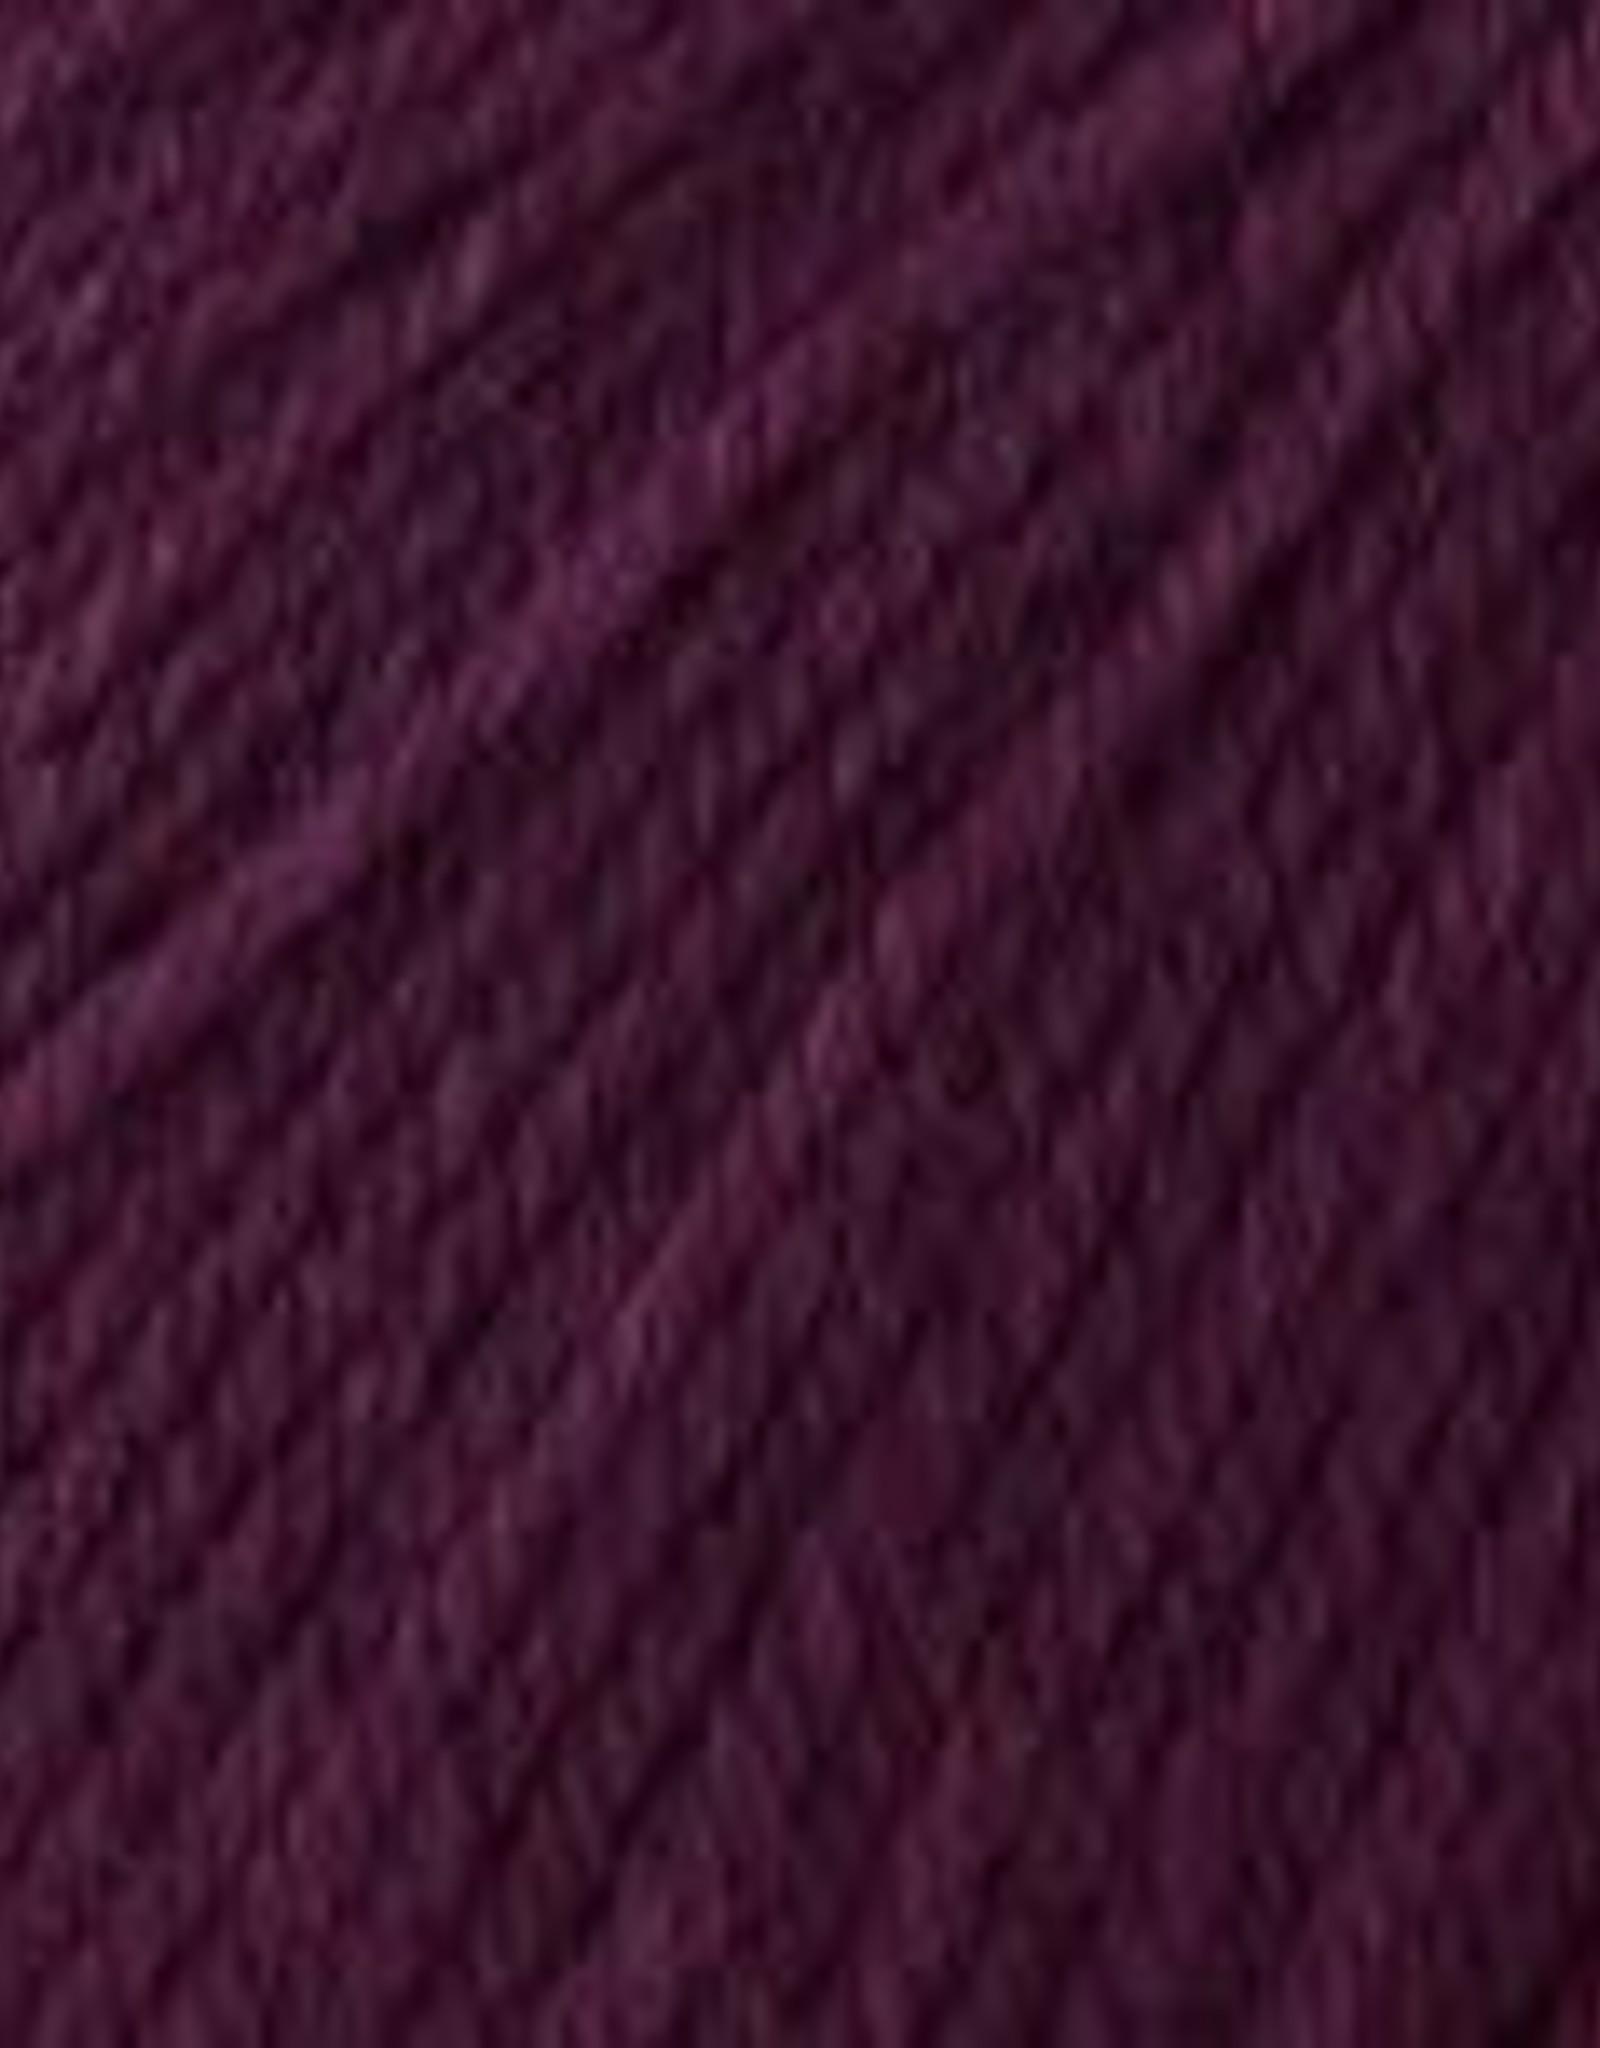 Universal Yarn Deluxe Bulky Superwash 943 Plum Dandy